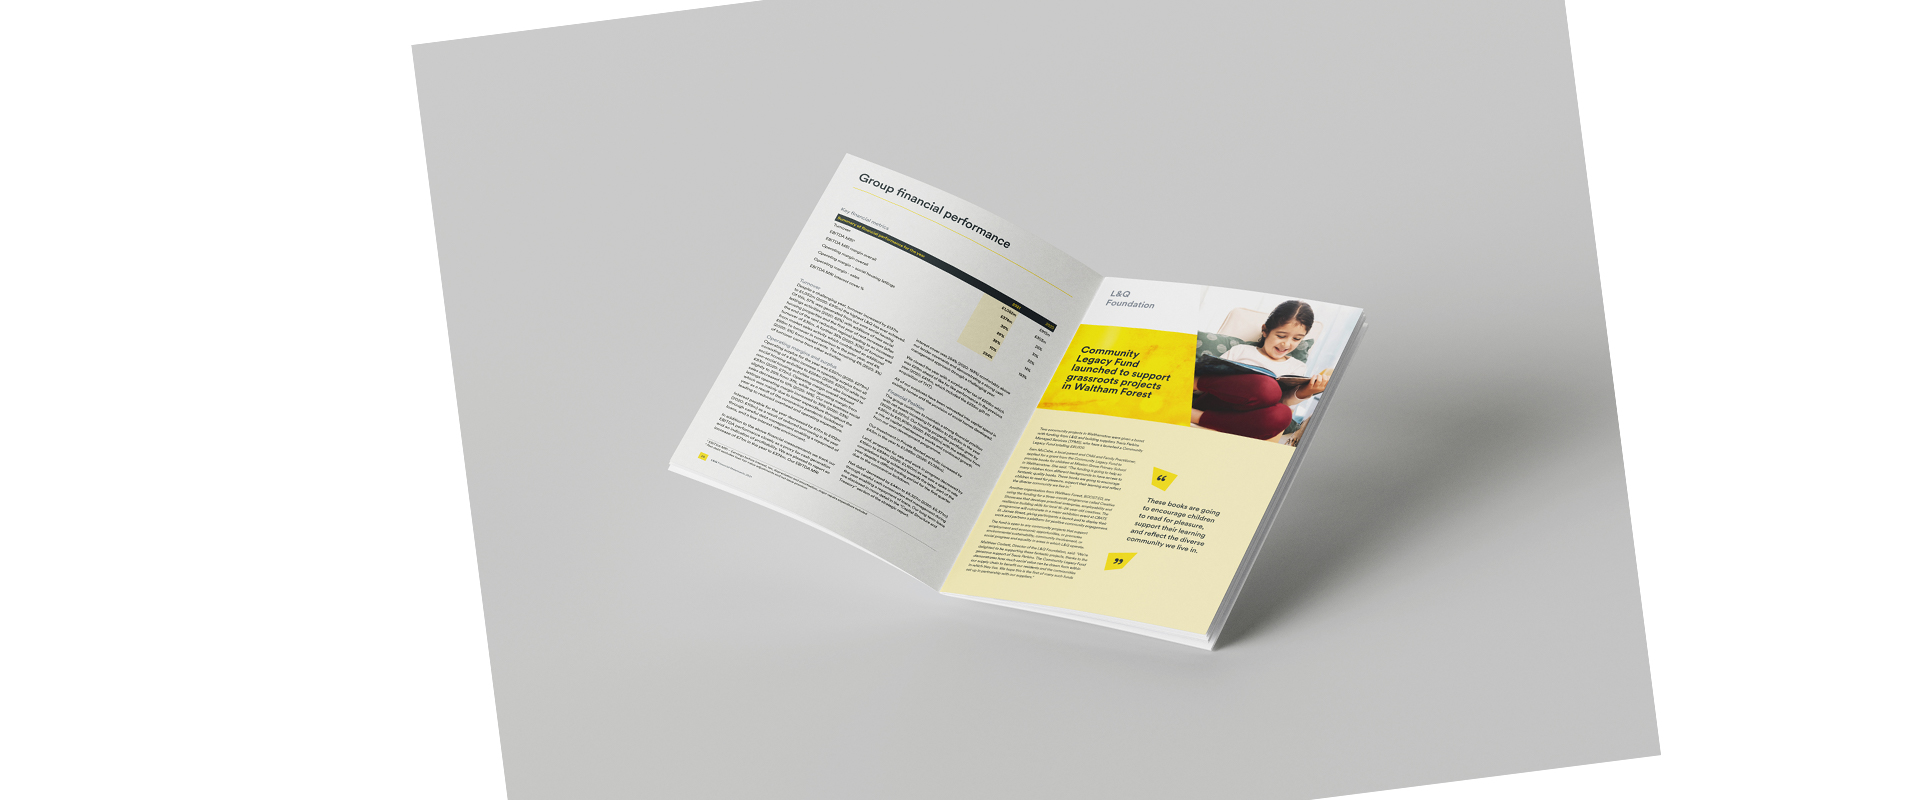 L&Q's Financial Statements 2021 booklet